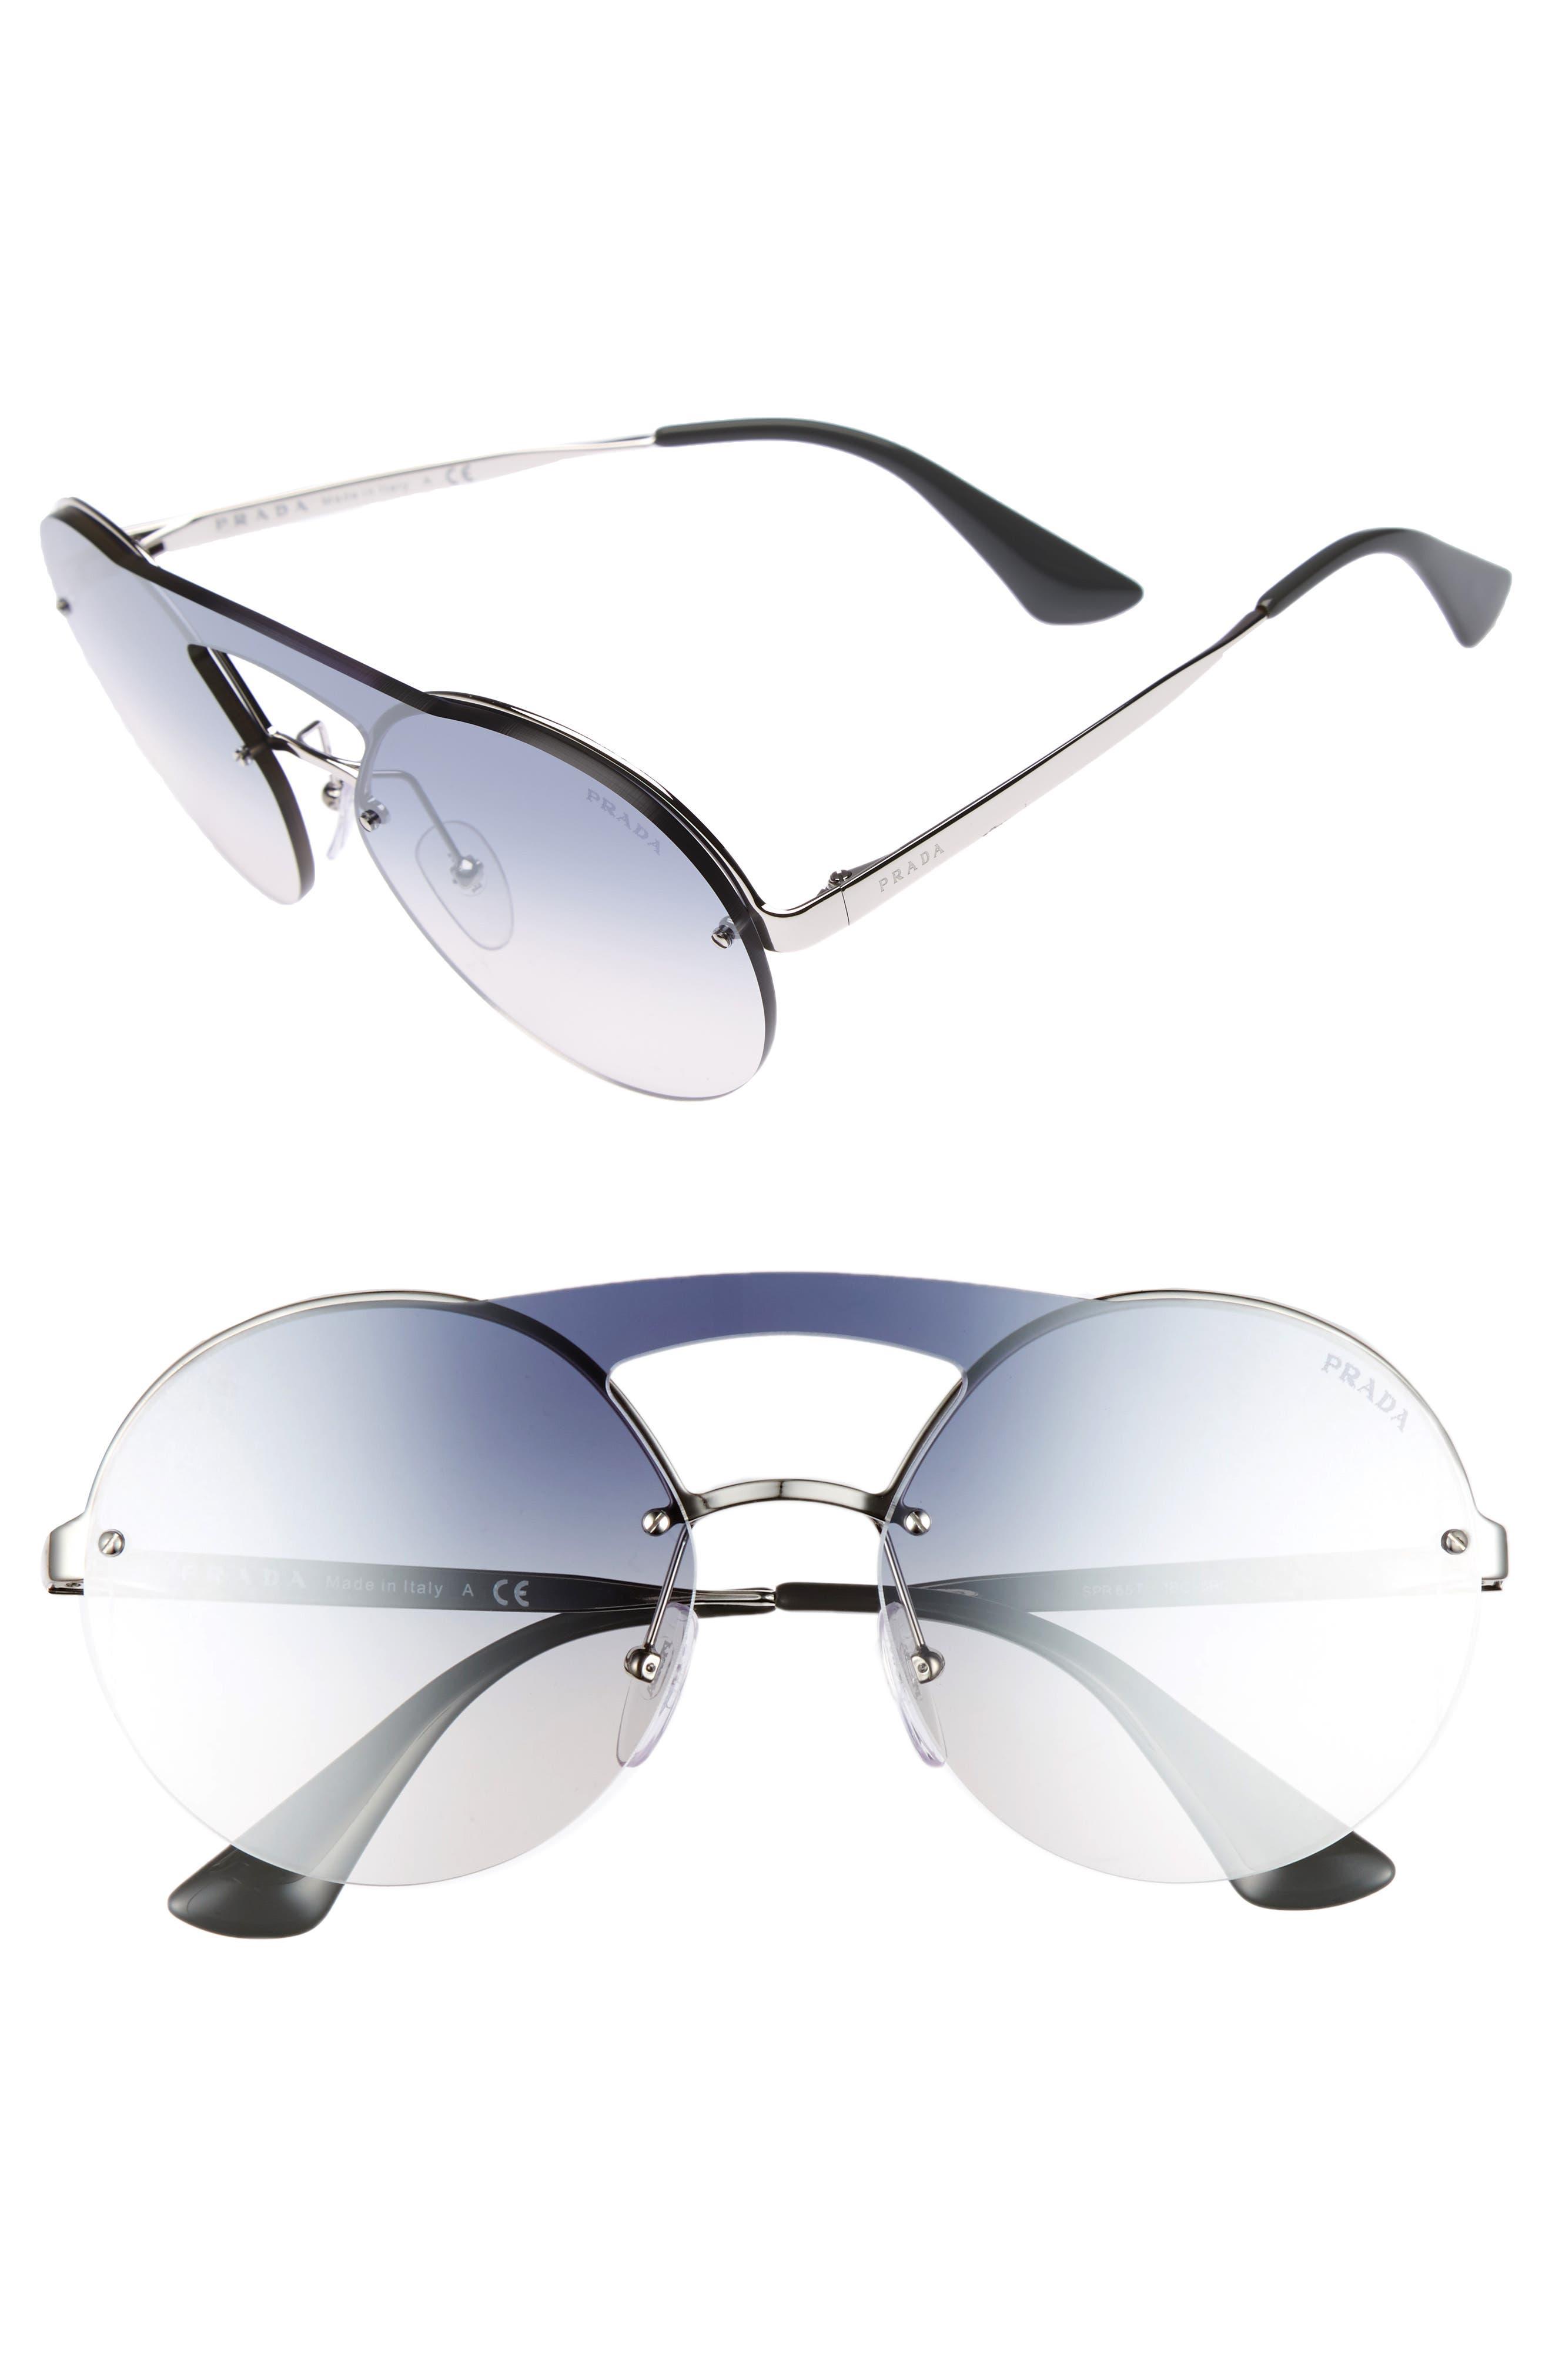 Main Image - Prada 60mm Rimless Shield Sunglasses